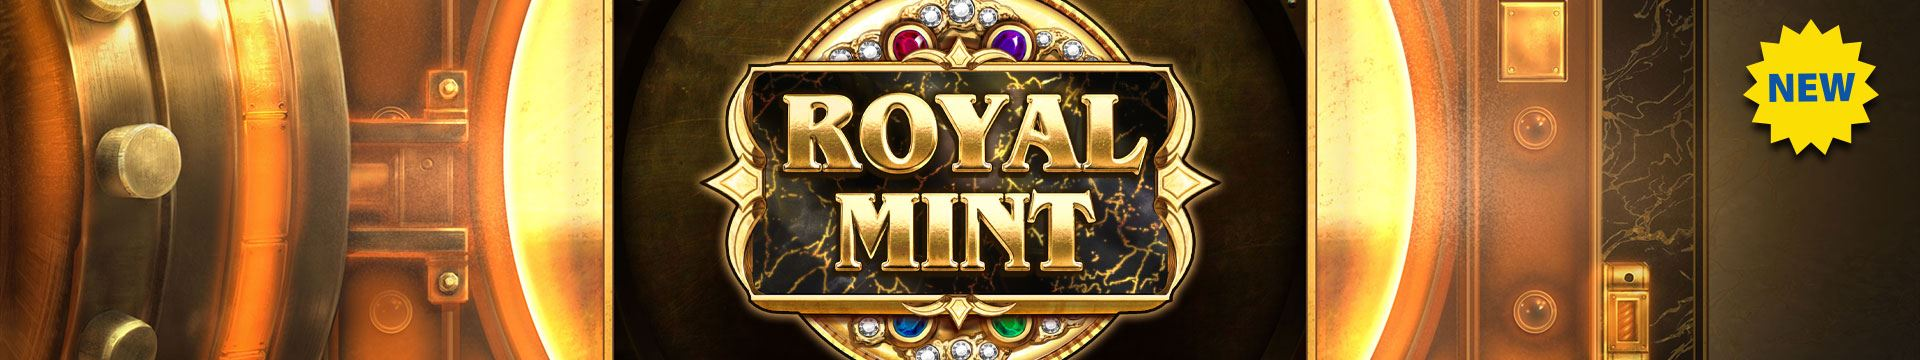 Royal_Mint